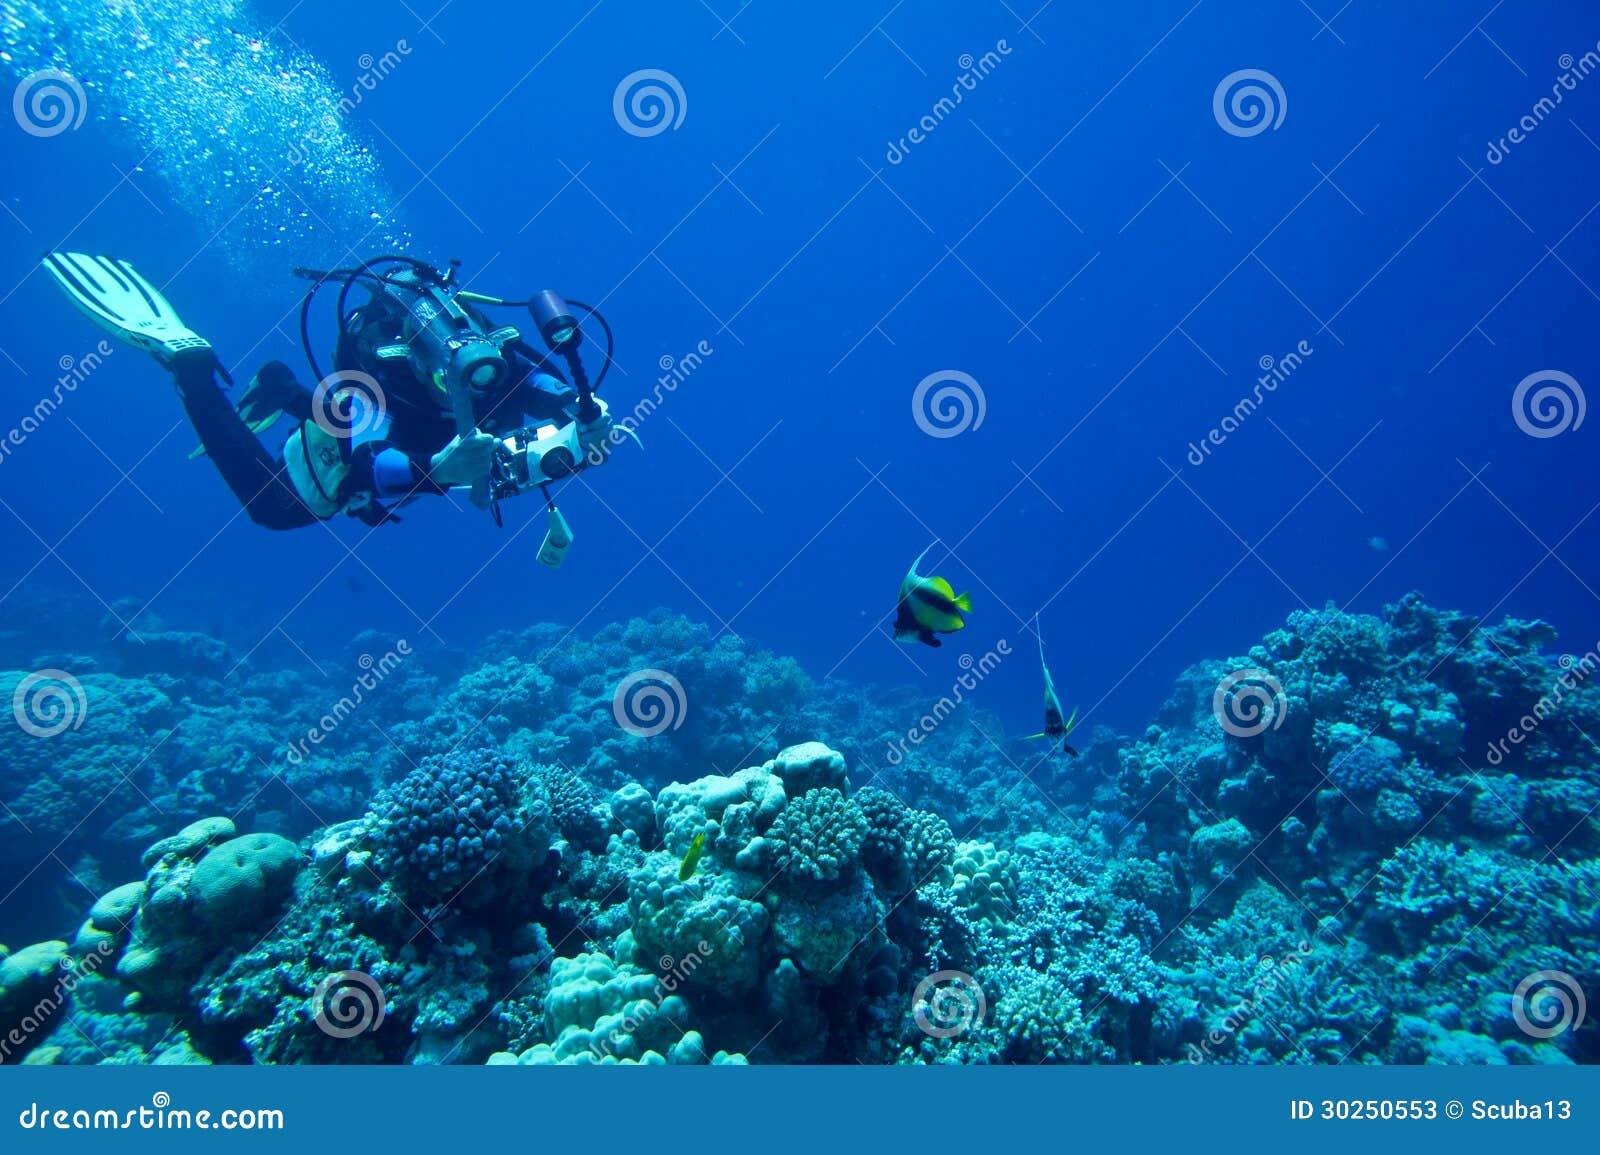 Scuba diver takes Underwater photo